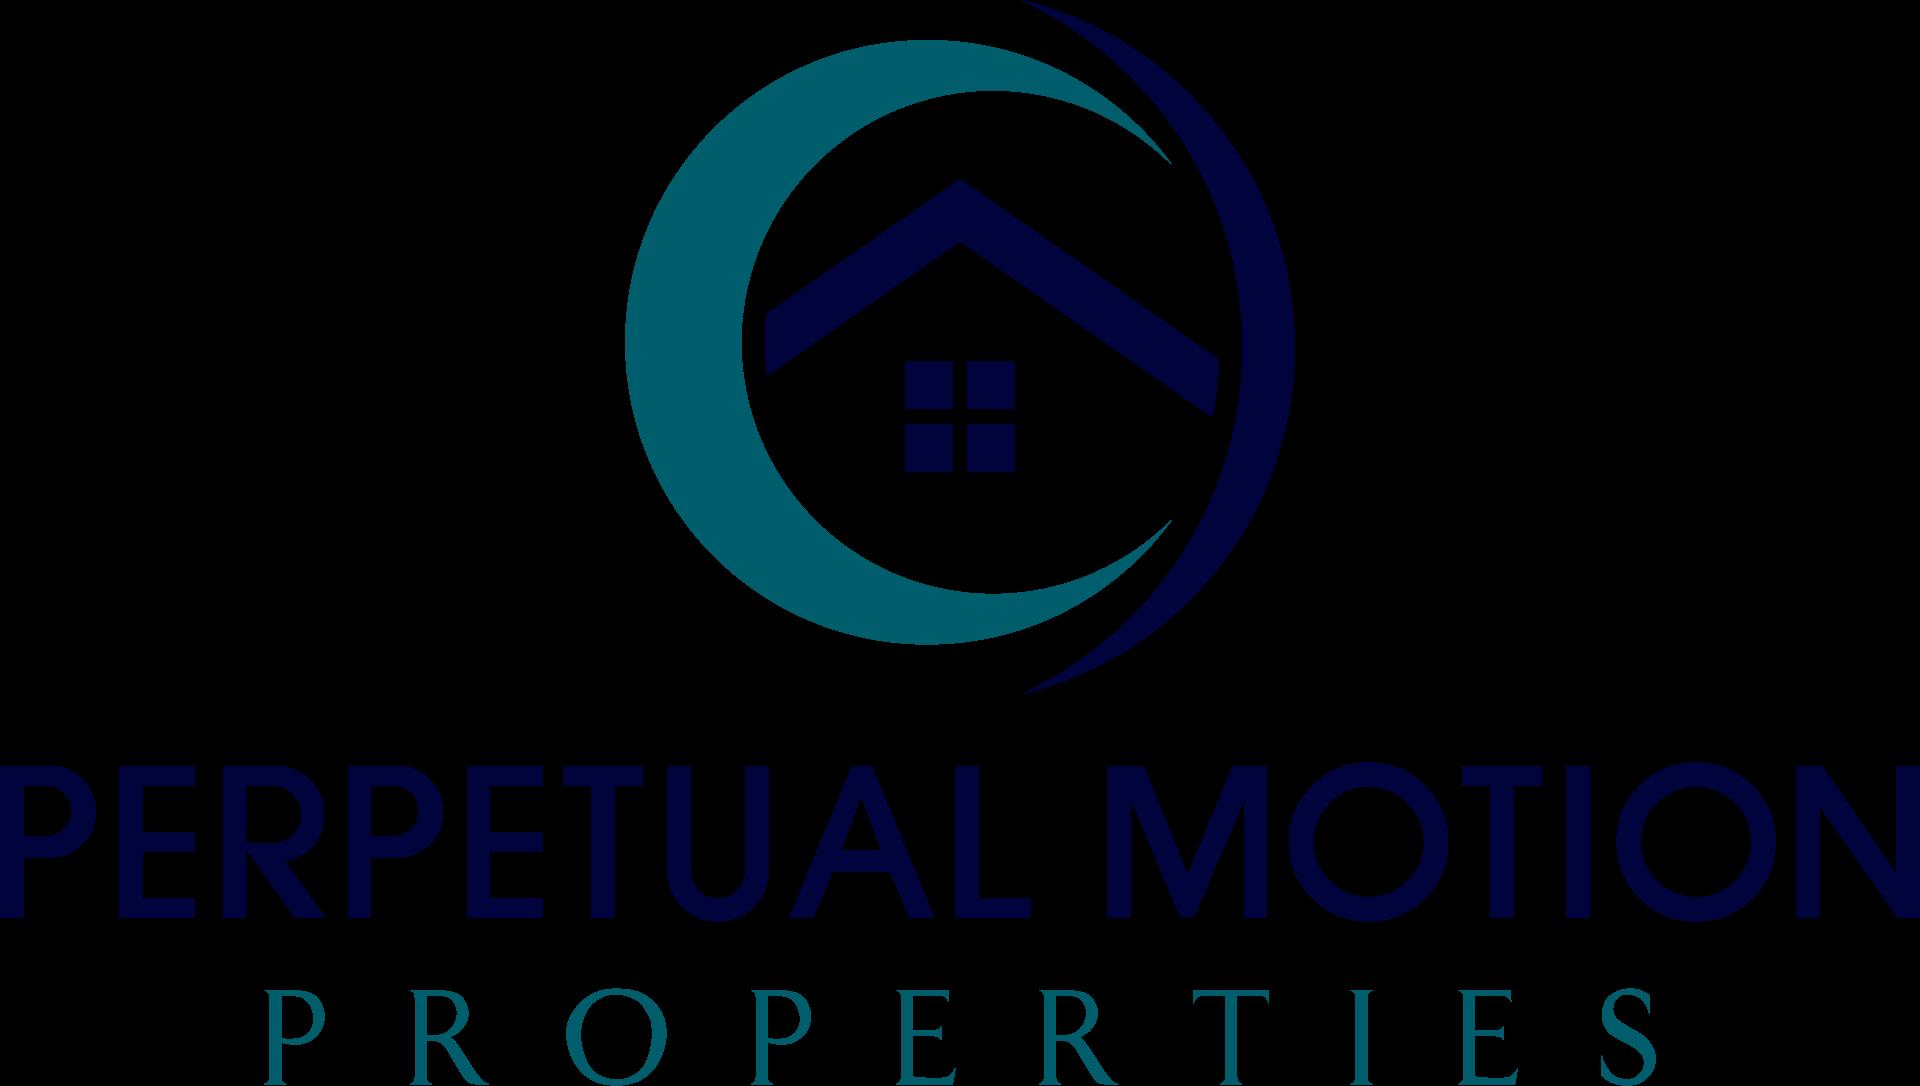 Perpetual Motion Properties logo